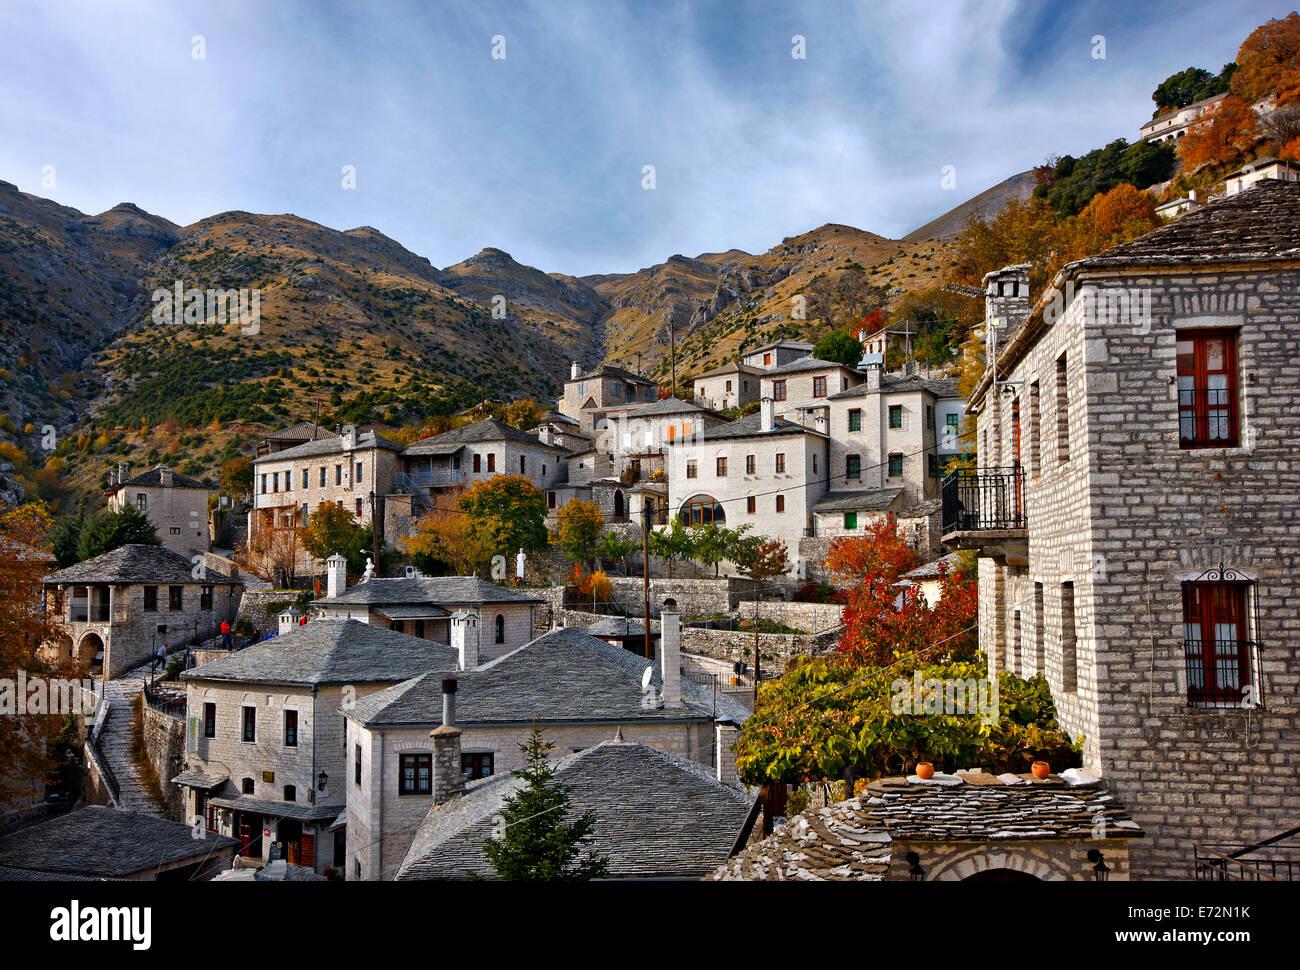 Syrrako village, one of the most beautiful Greek mountainous villages, on Tzoumerka mountains, Ioannina, Epirus, - Stock Image